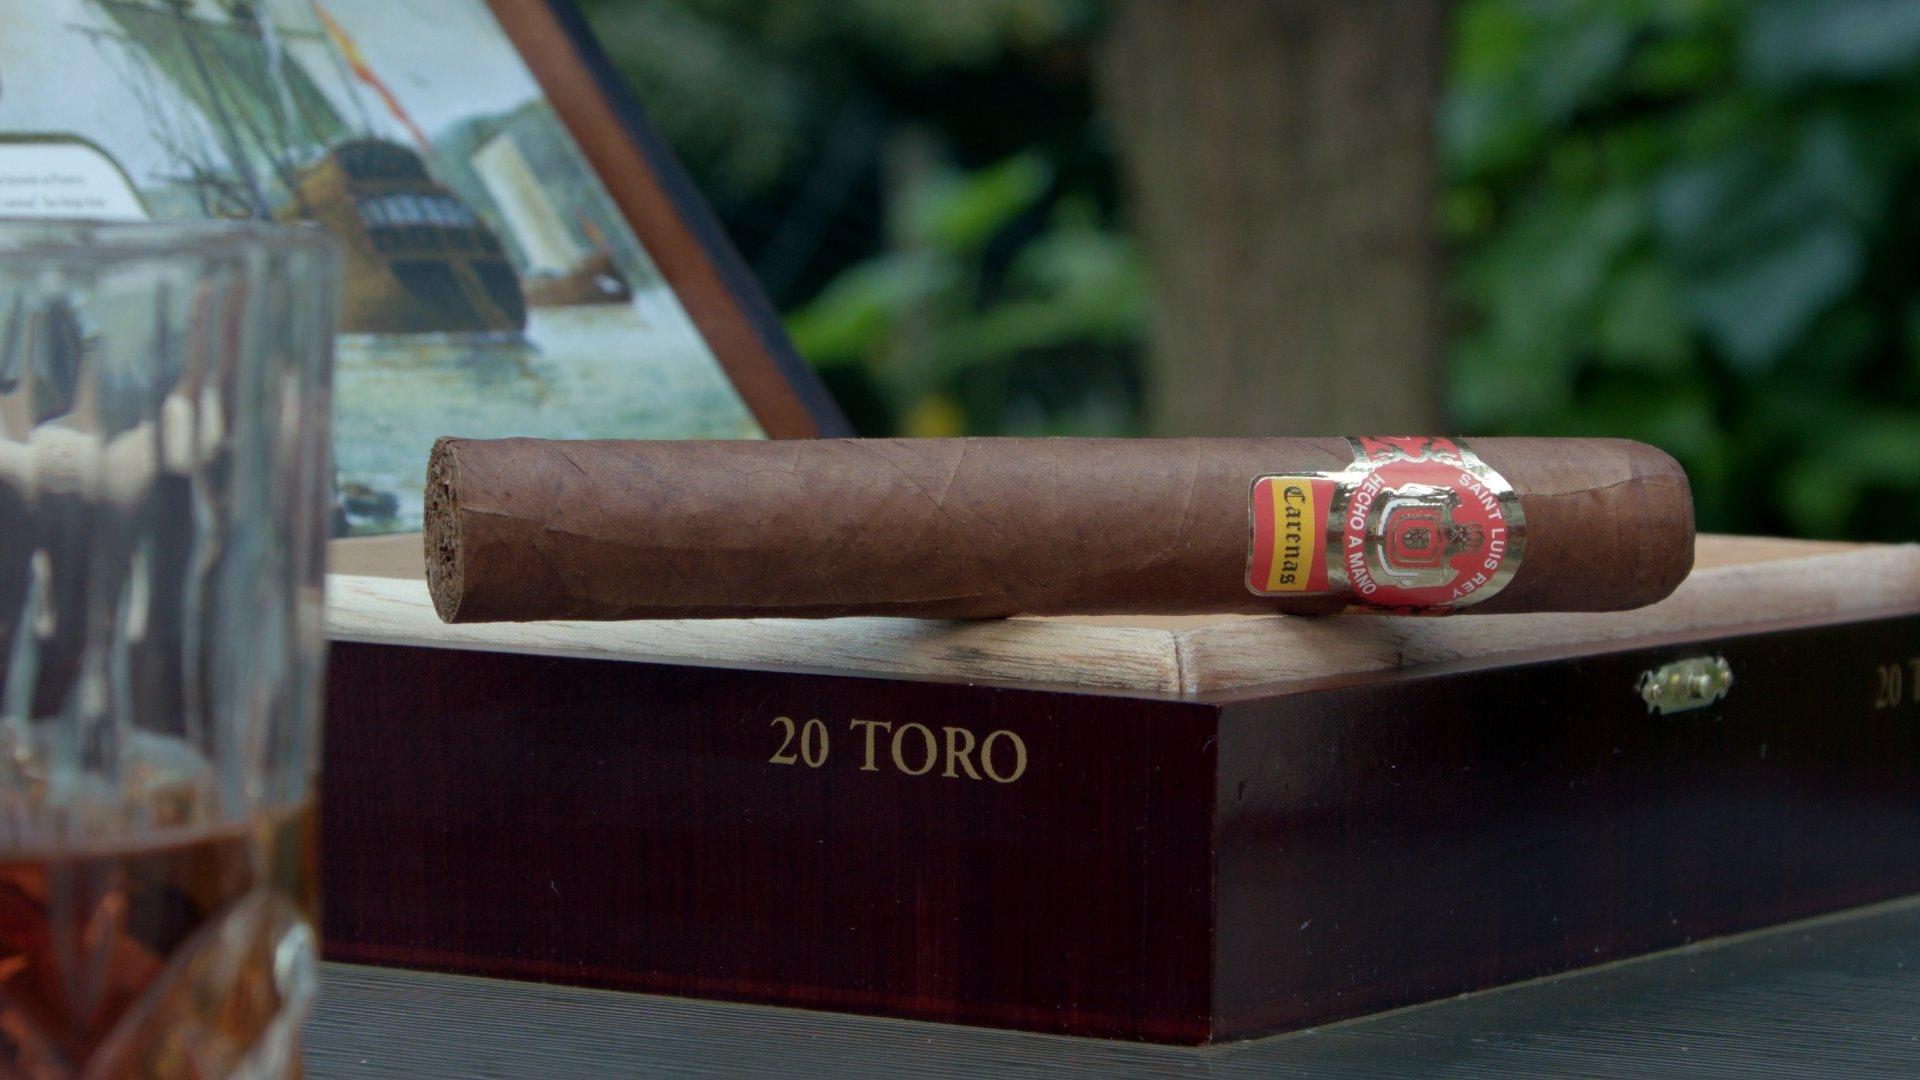 saint luis rey carenas toro cigar drink pairing from the cigar advisor panel review